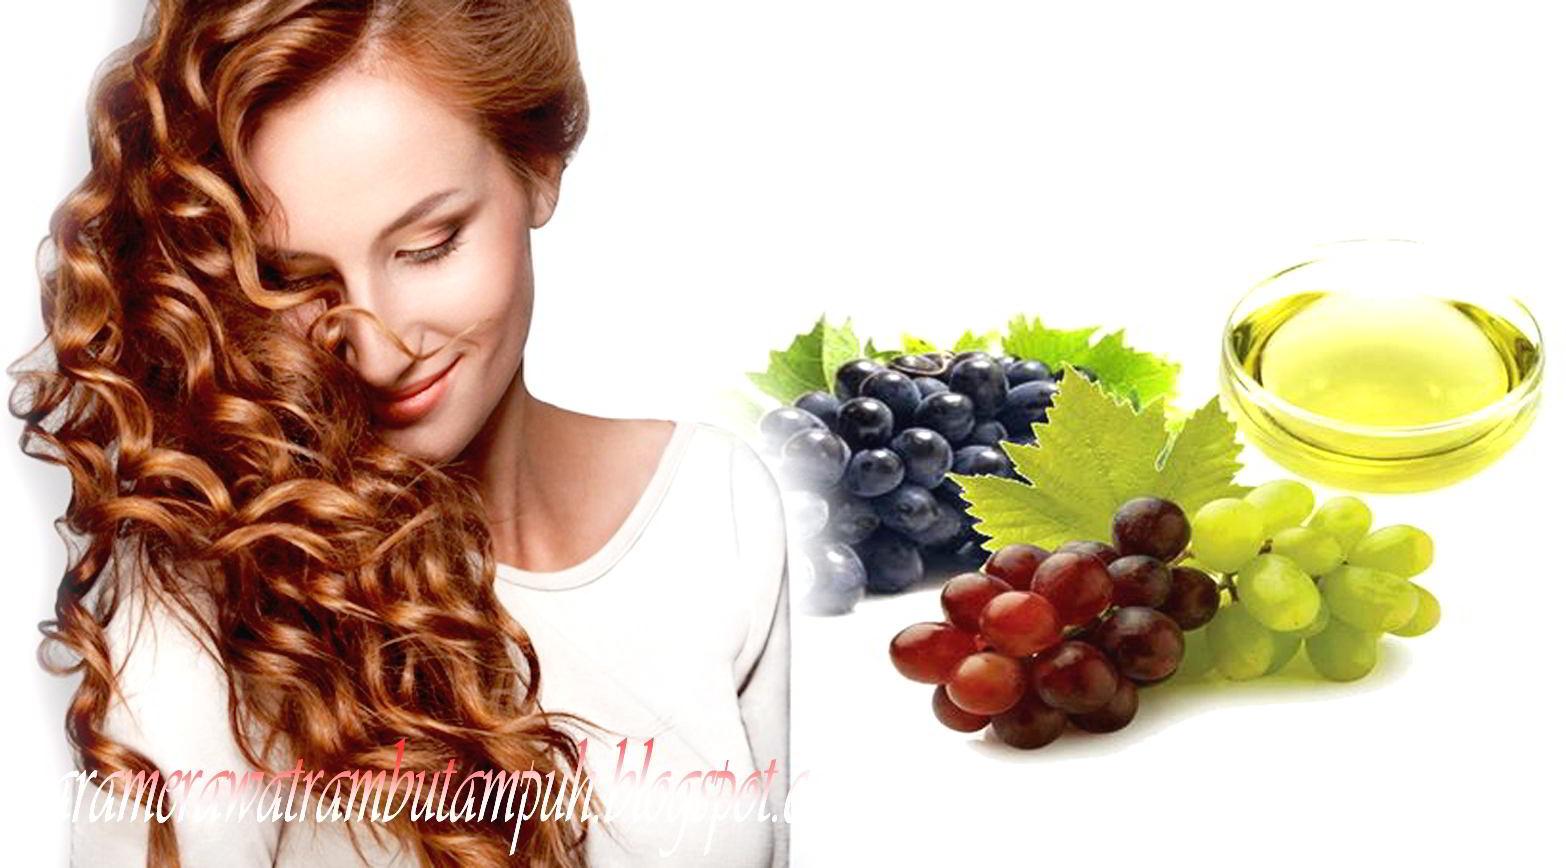 Khasiat Minyak Biji Anggur untuk Rambut